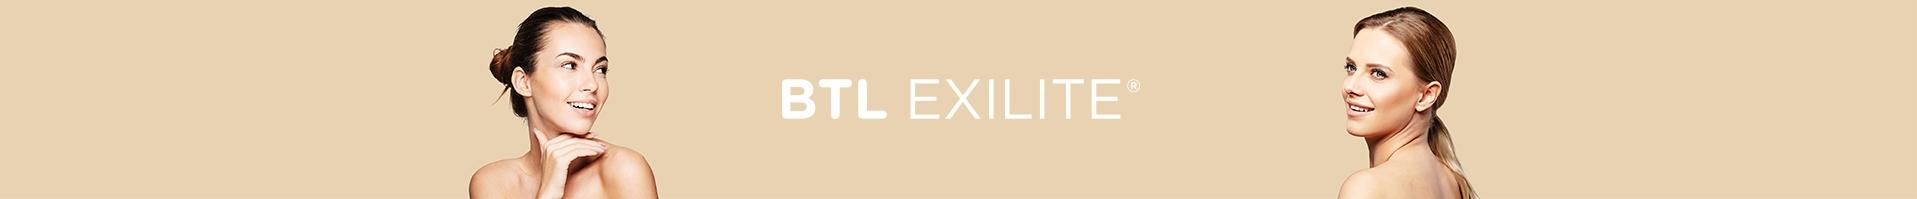 header-exilite